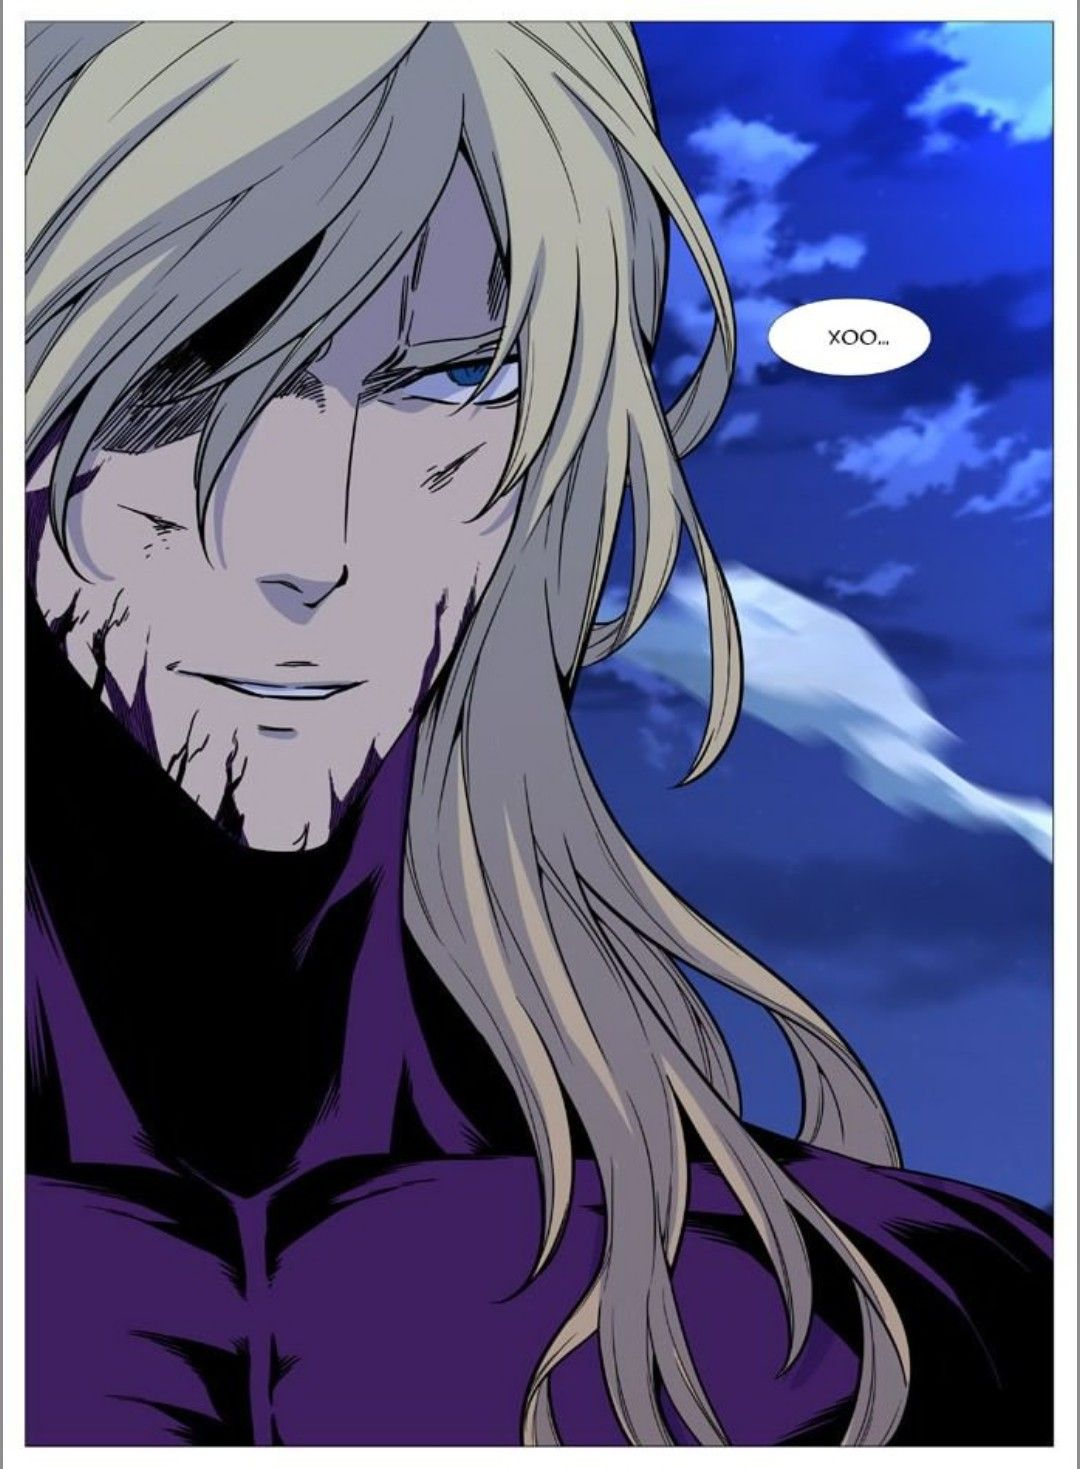 Pin by Winter on Noblesse Fantasy heroes, Noblesse, Webtoon